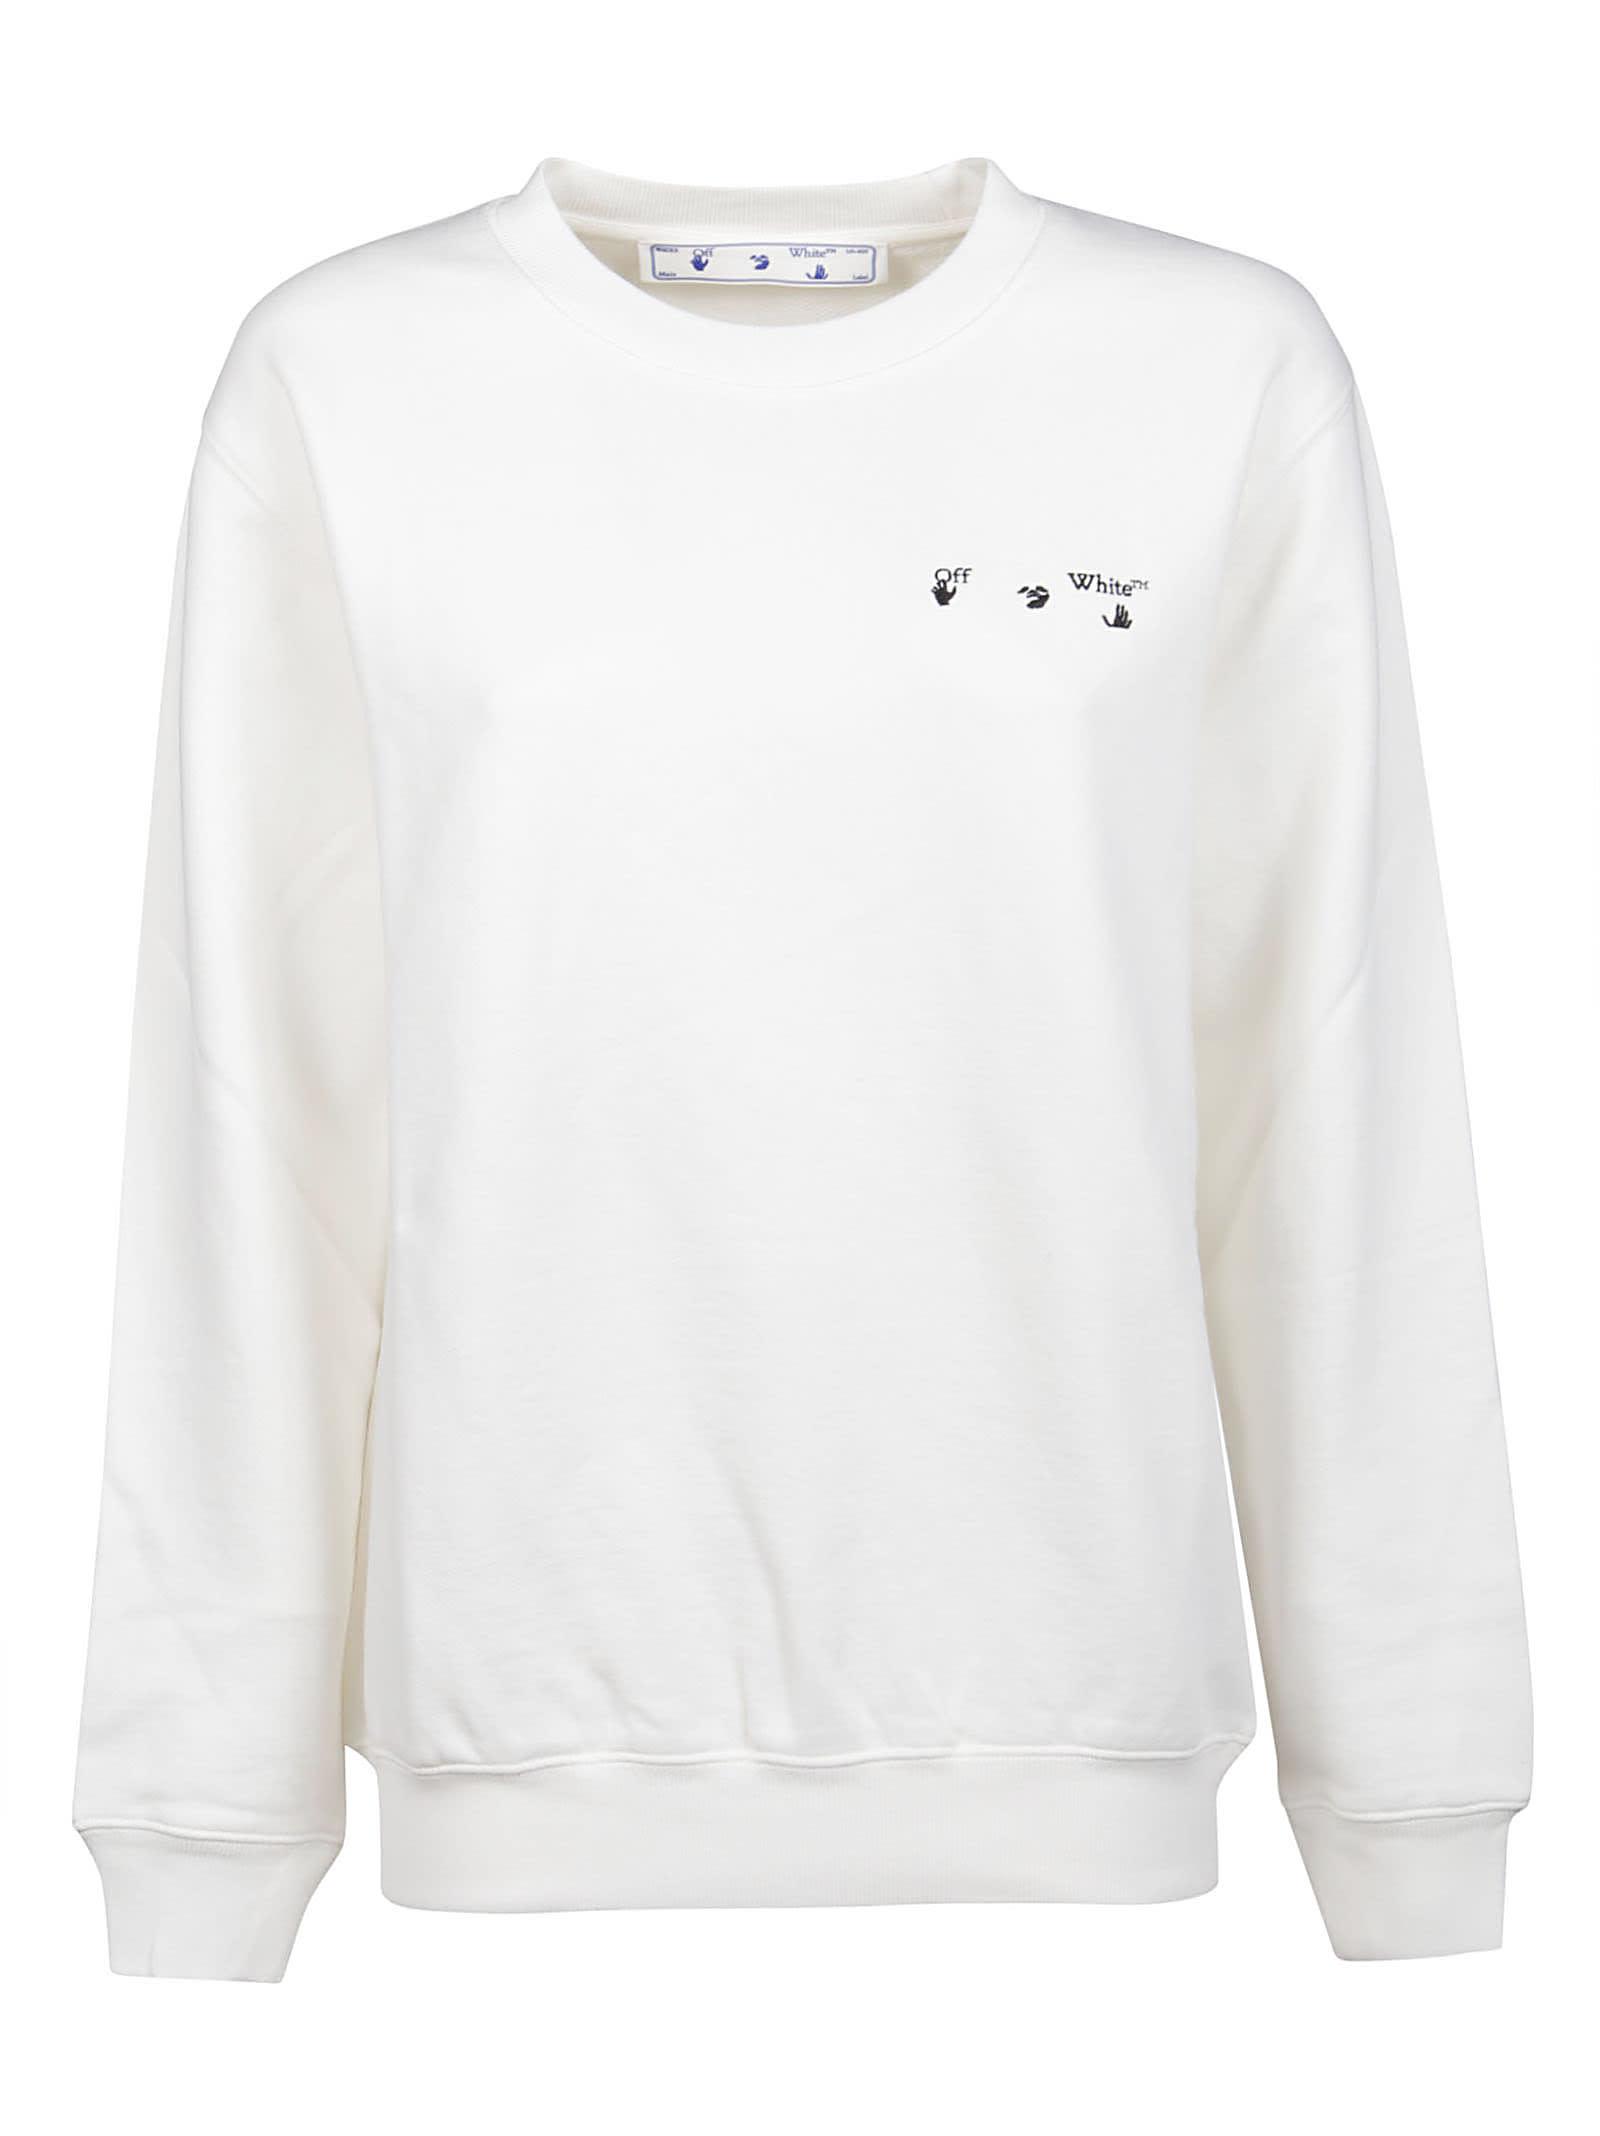 Off-White Sweatshirt Arrow Liquid Metal